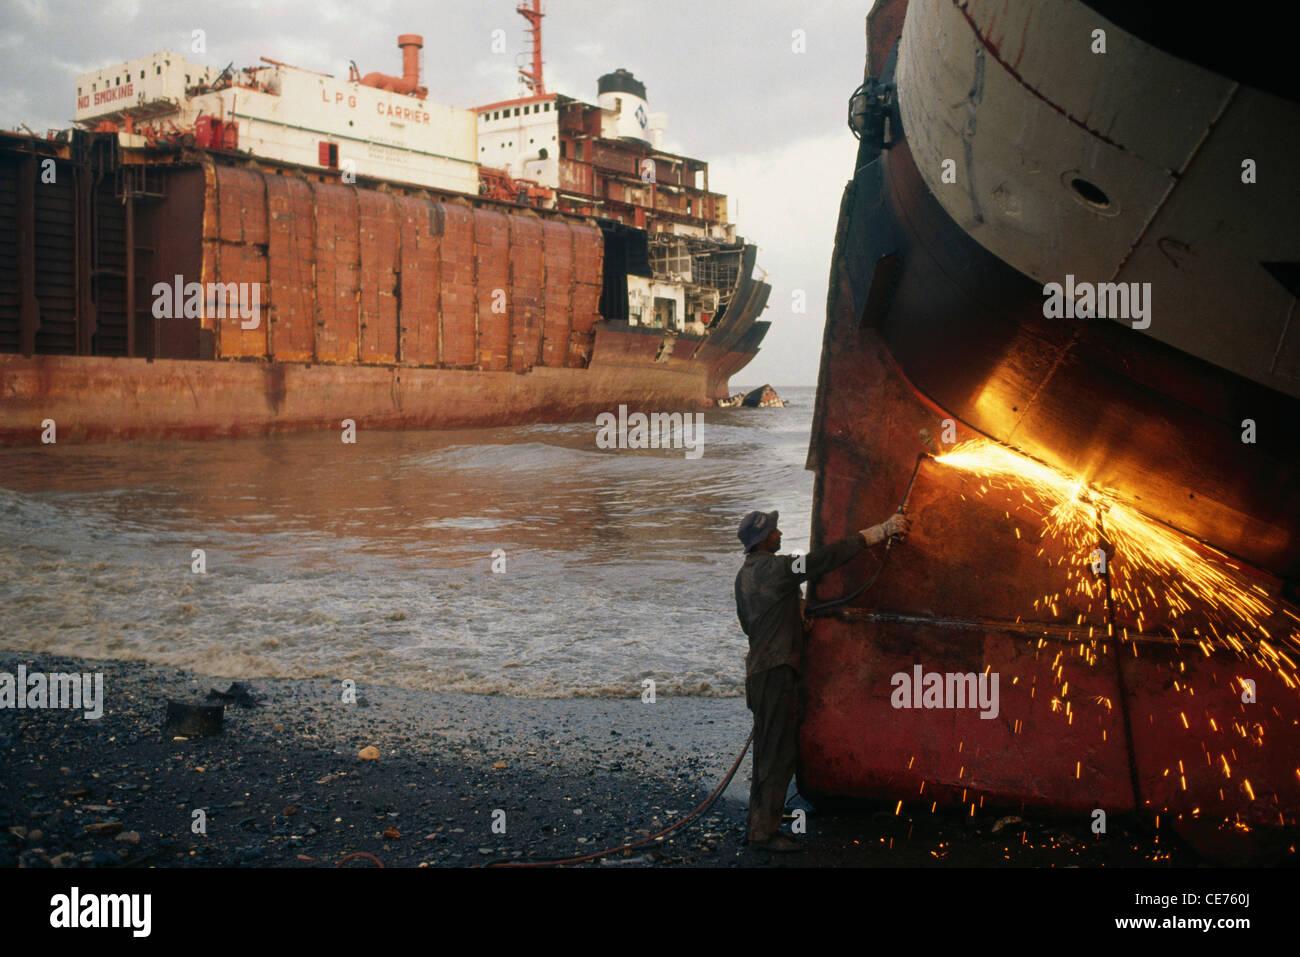 RVA 83115 : indian man gas cutting steel plate in alang ship breaking yard gujarat india Stock Photo